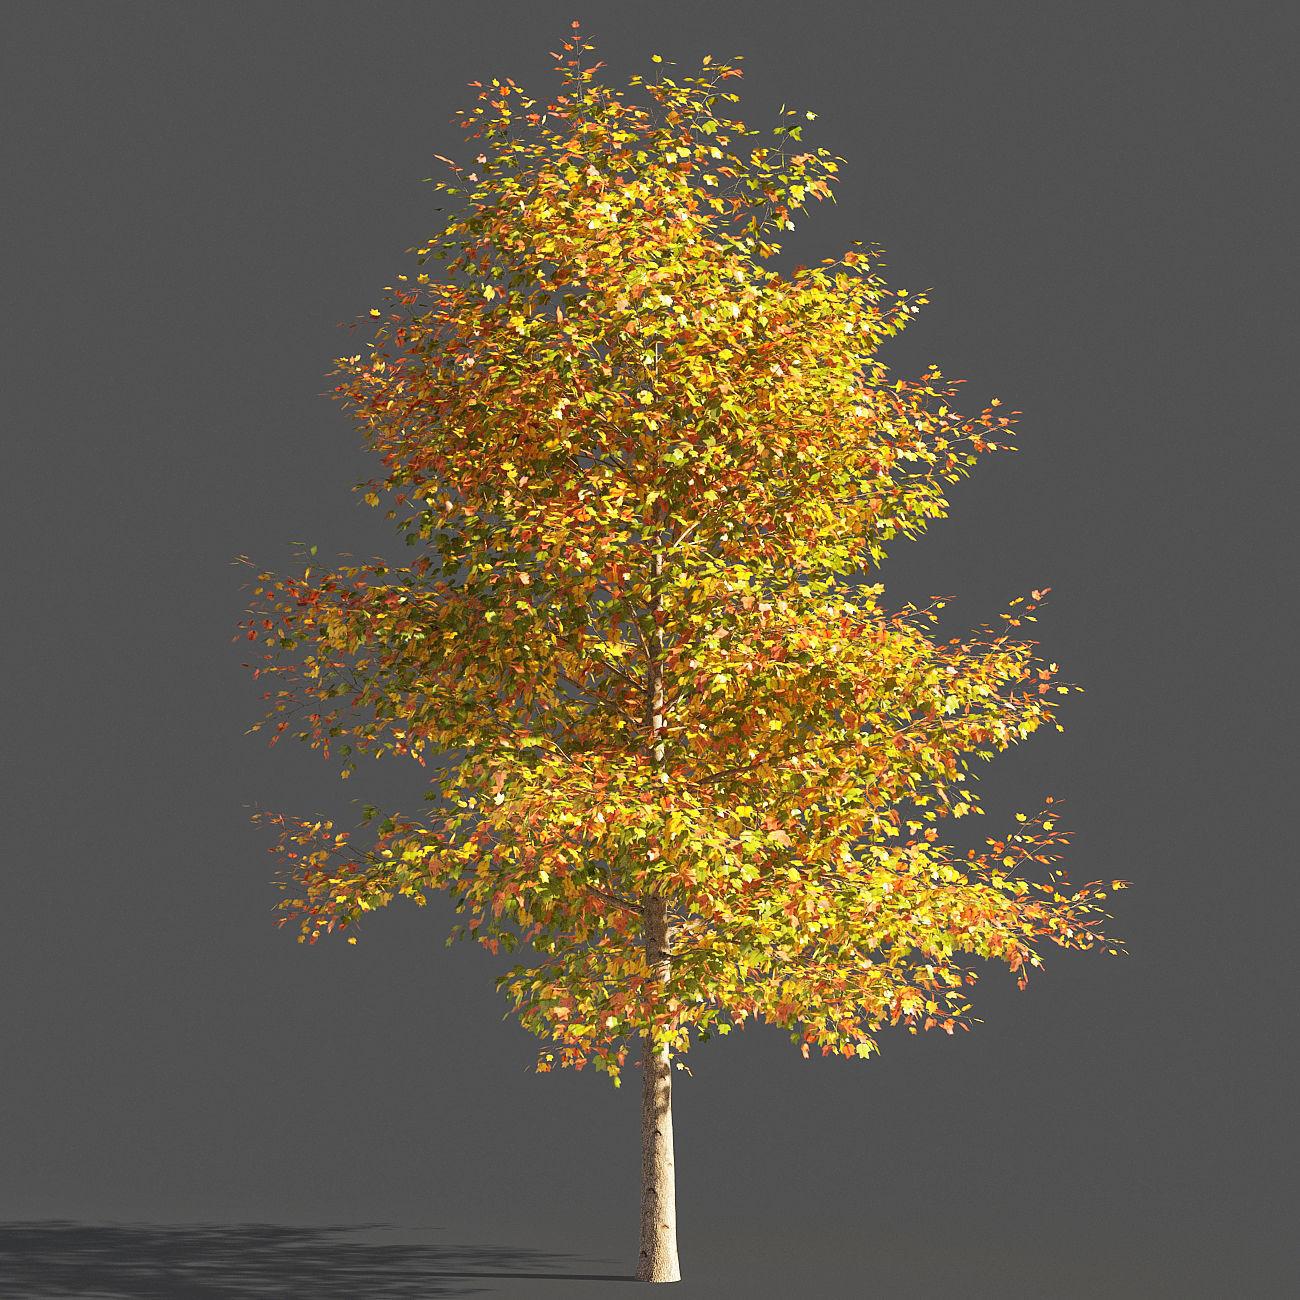 TULIP TREE 2